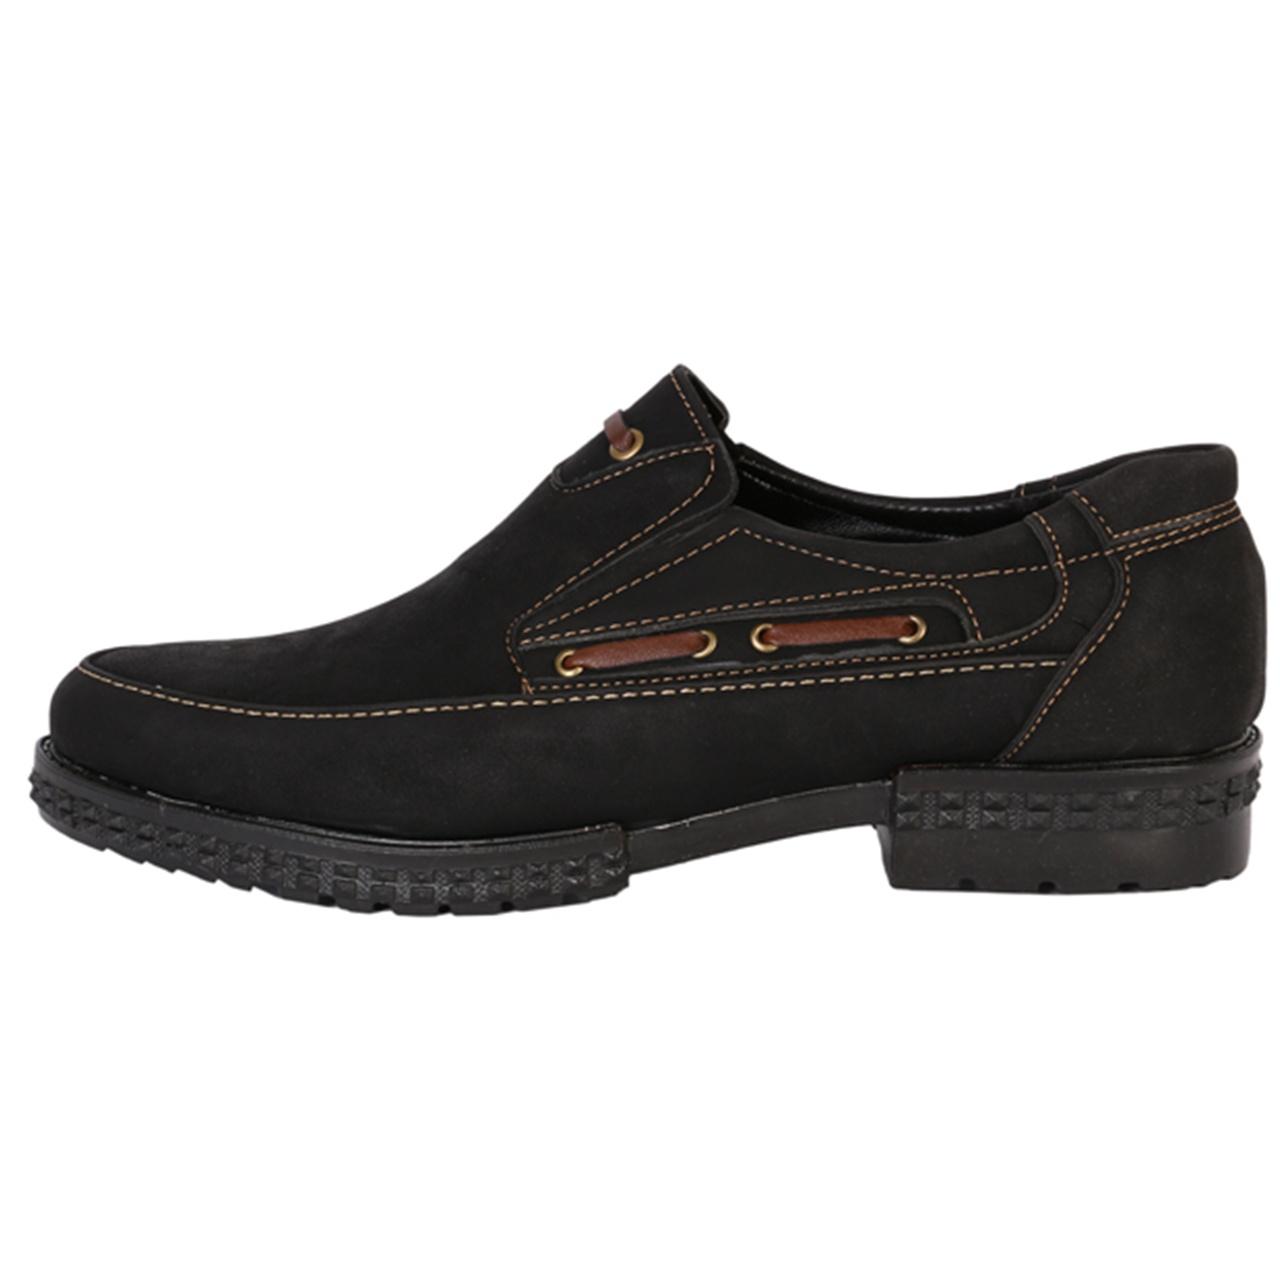 کفش مردانه فیوچر کد K.has.040